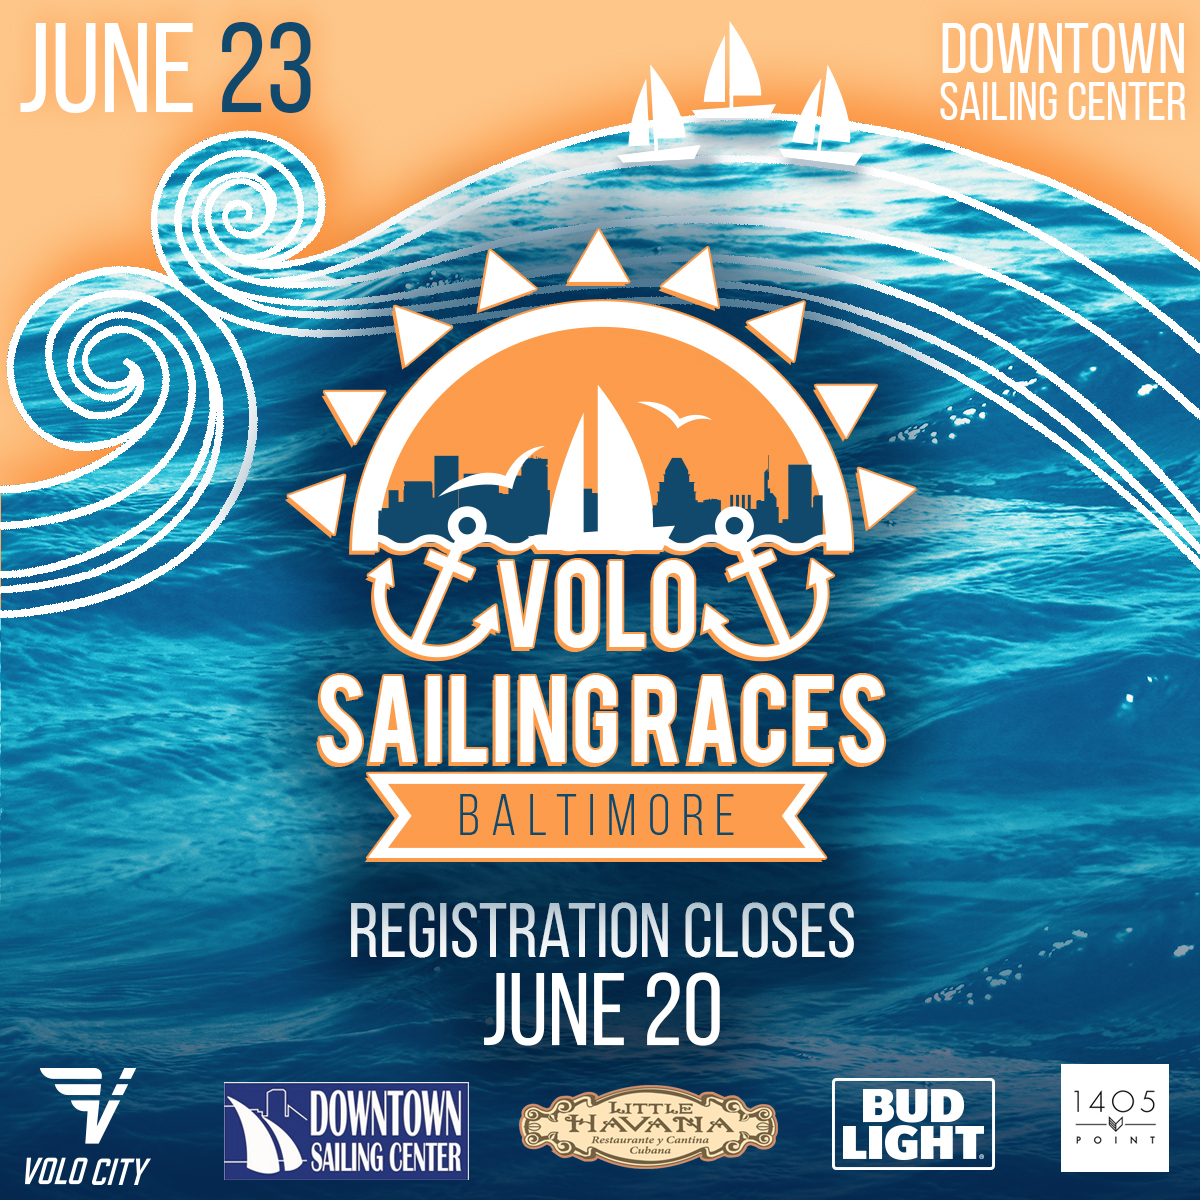 Volo_SailingRaces_Insta.jpg